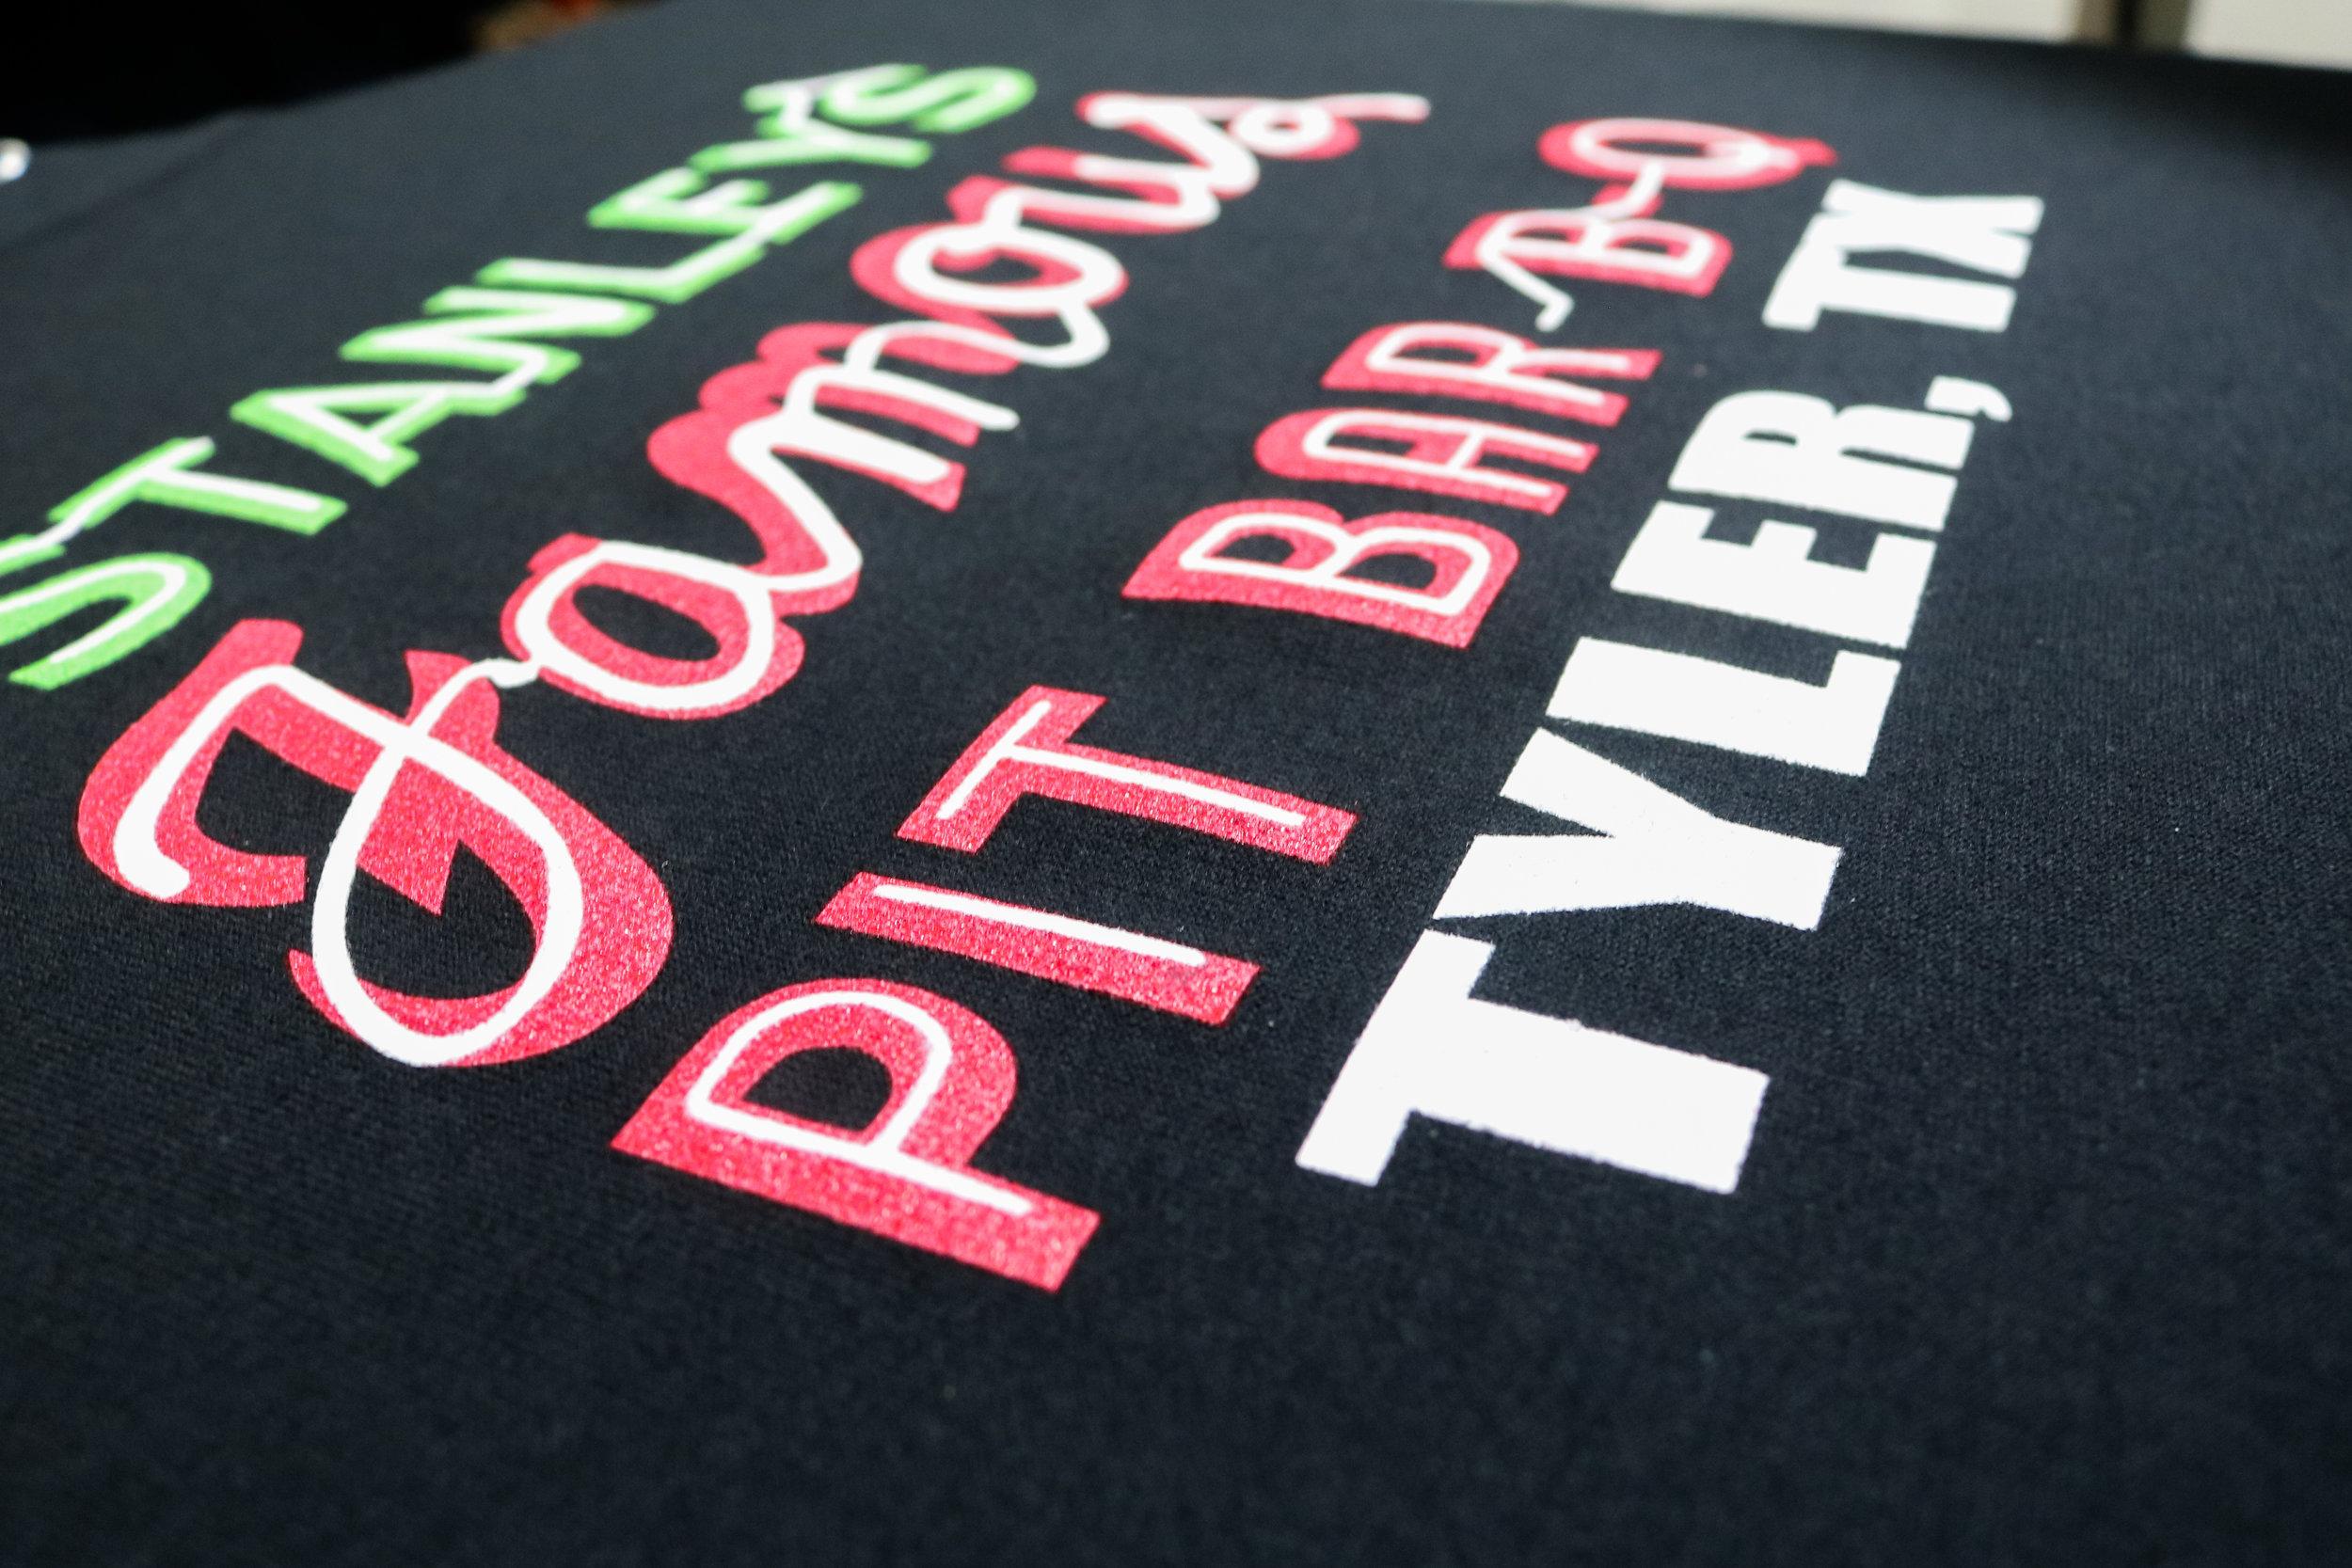 Stanley's BBQ Tyler, Tx Screen Printed Shirts